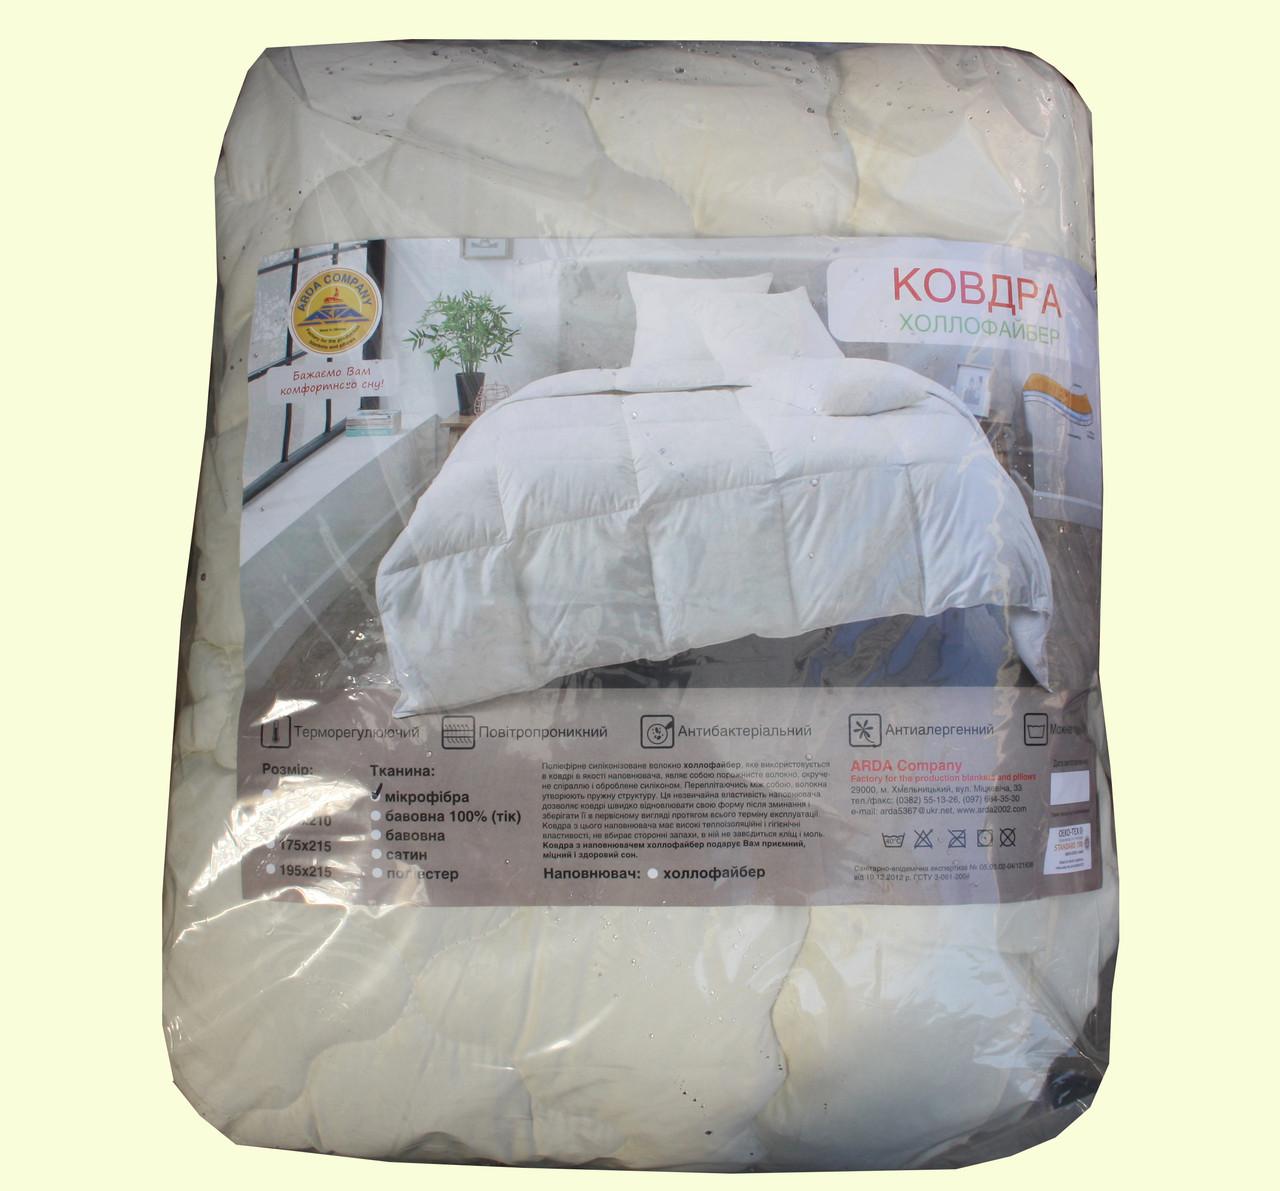 Одеяло однотонное 150*210 Холлофайбер ARDA Company